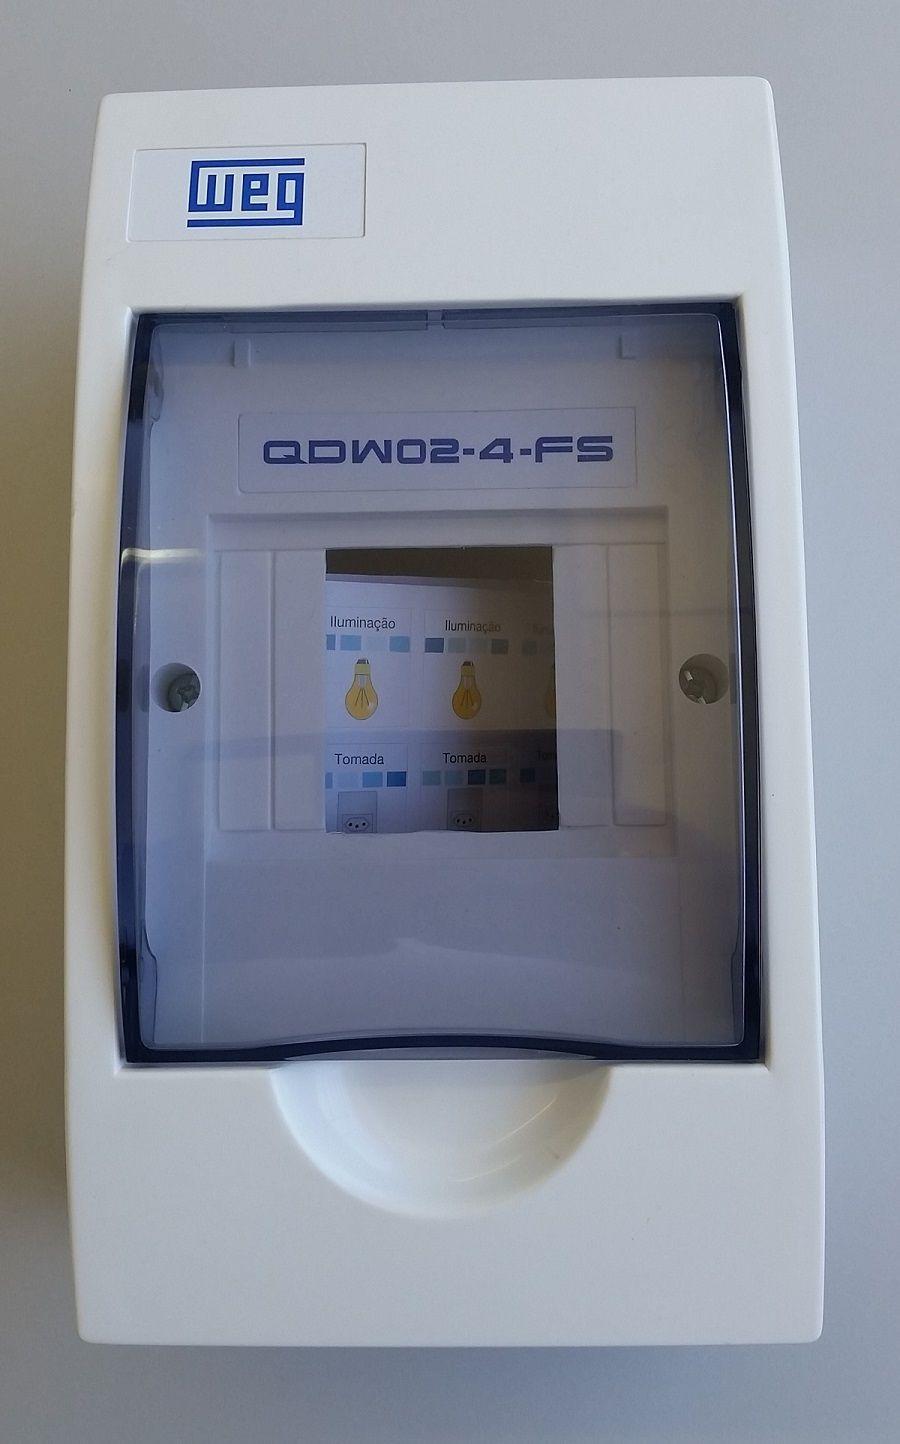 Quadro Distribuição P/ 4 Minidisjuntores QDW02-4-BS C/ TAMPA FUME-11377401 WEG